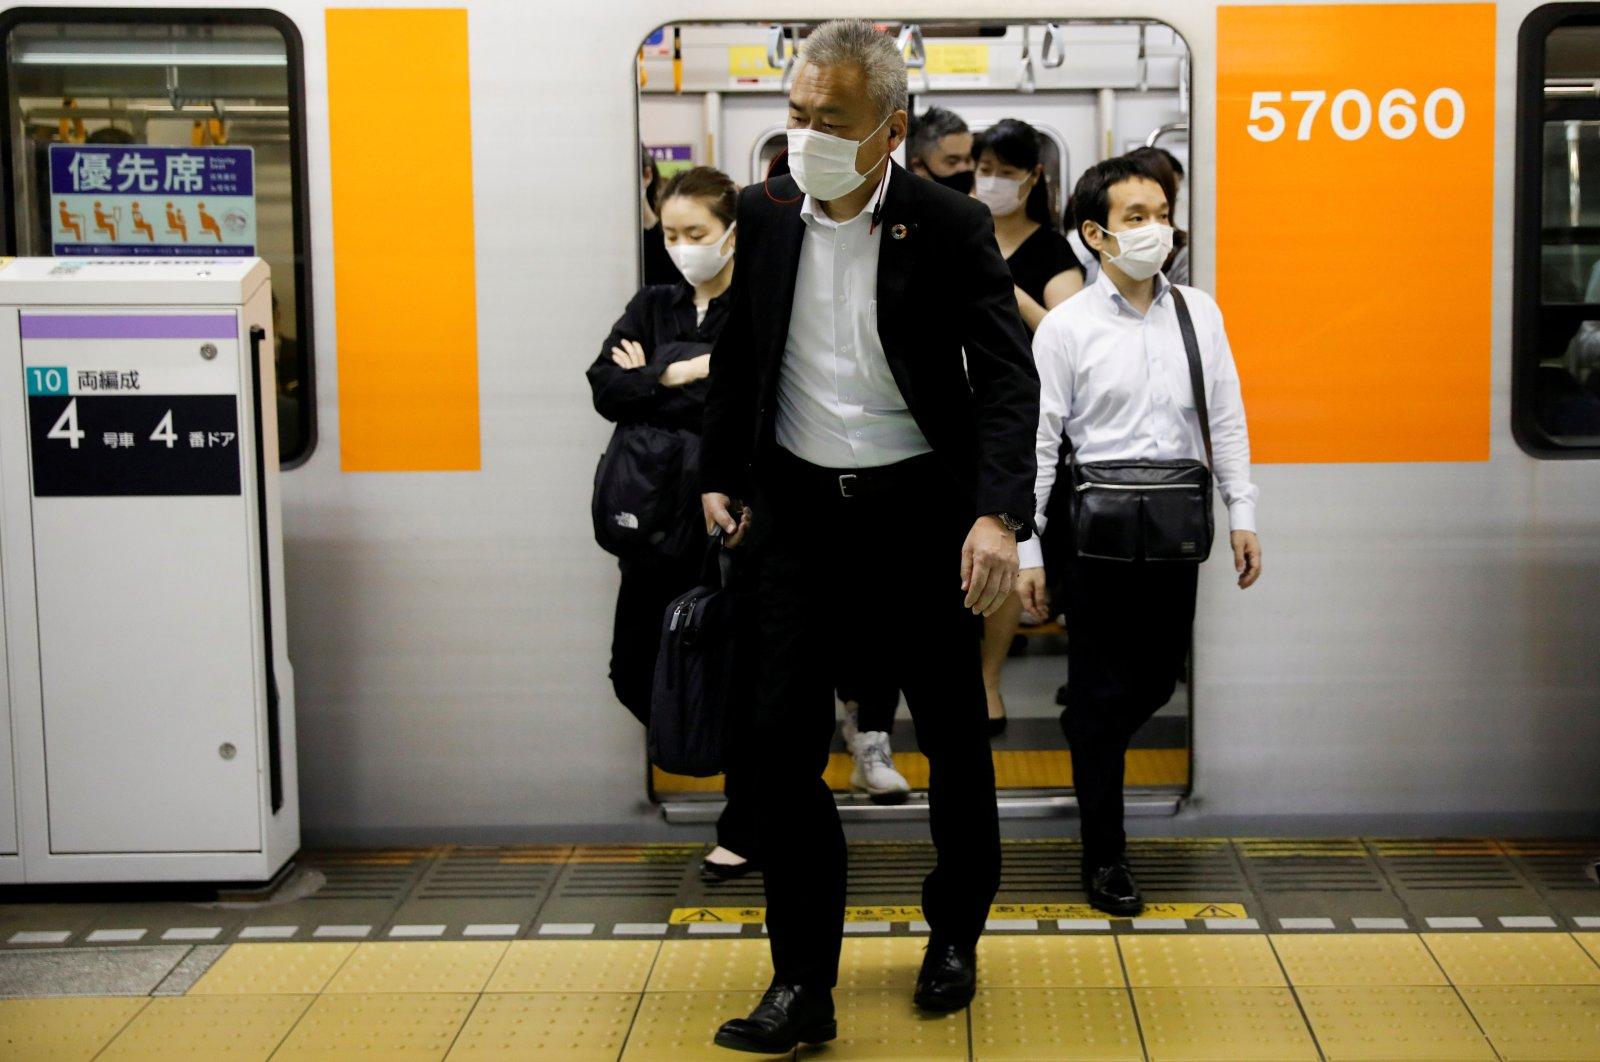 Passengers wearing protective masks get off a subway train at Shibuya station amid the coronavirus outbreak in Tokyo, Japan, May 27, 2020. (Reuters Photo)